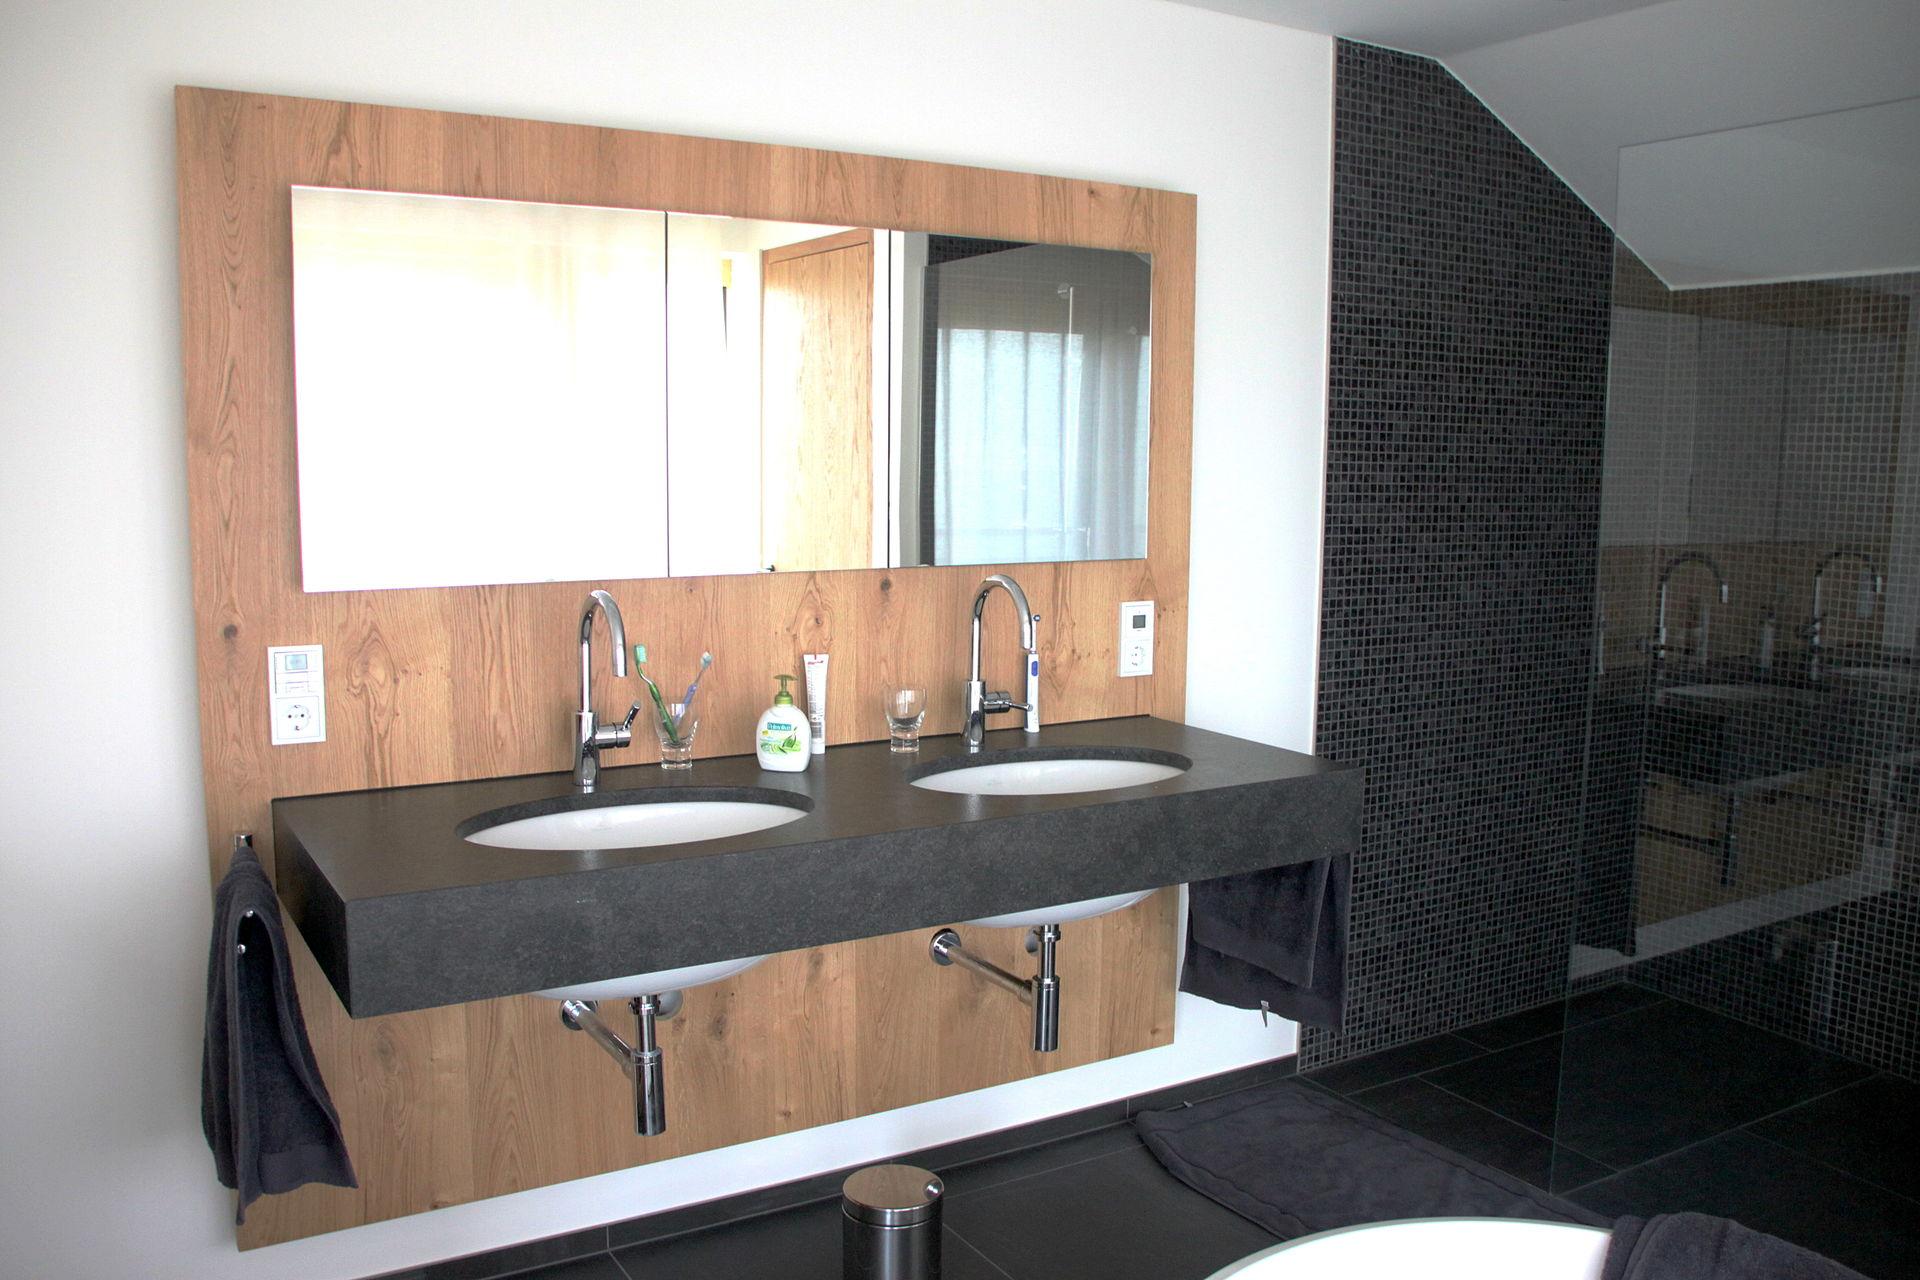 m bel f r das bad tischlerei k nzler. Black Bedroom Furniture Sets. Home Design Ideas